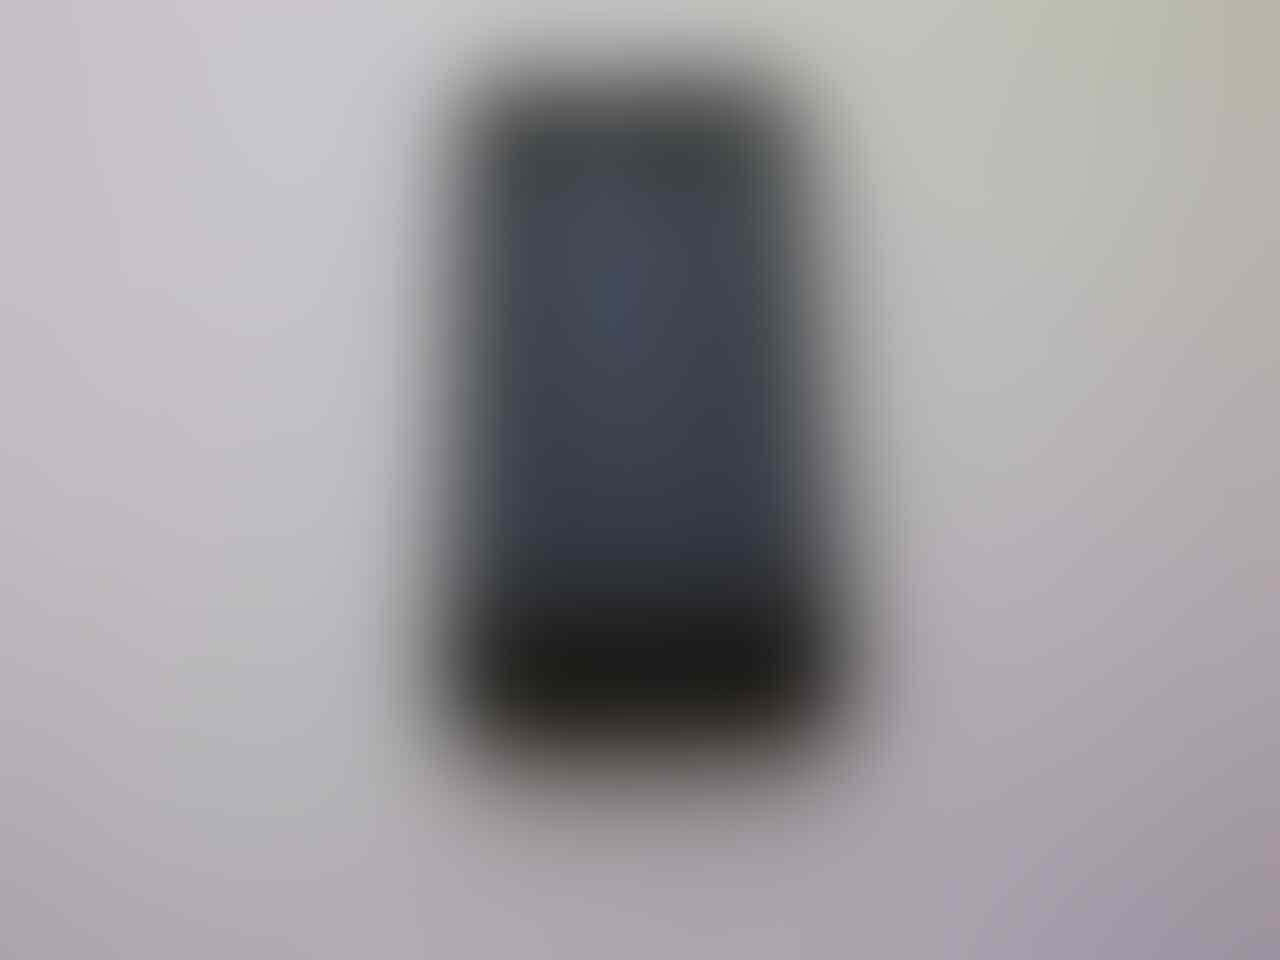 WTS IPHONE 4S 16GB HITAM